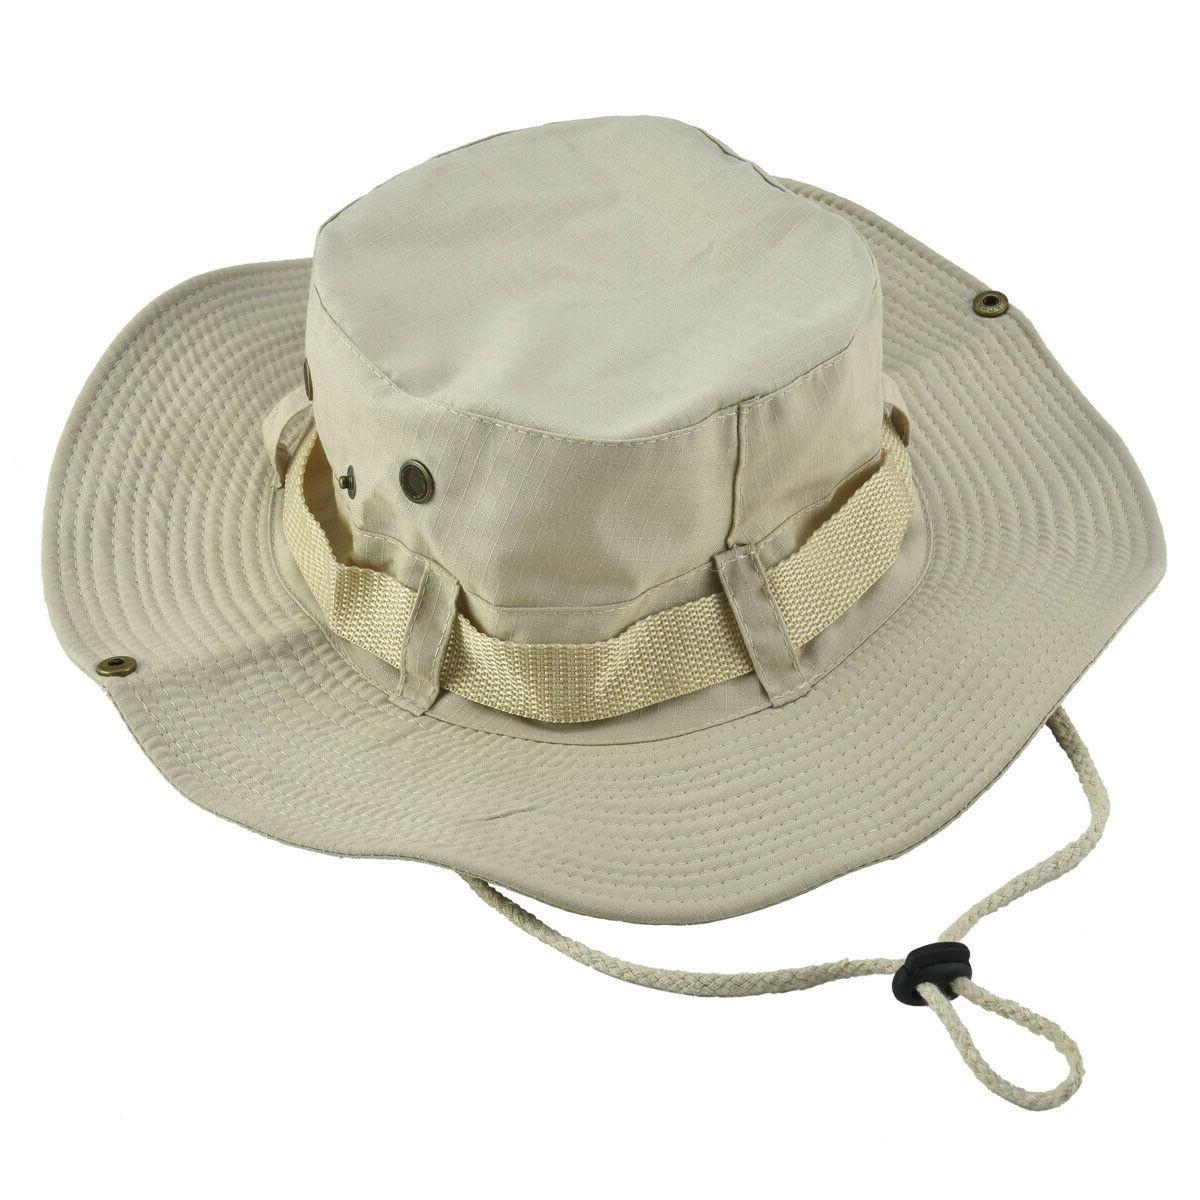 Fishing Hunting Mesh Camo Sun Cap